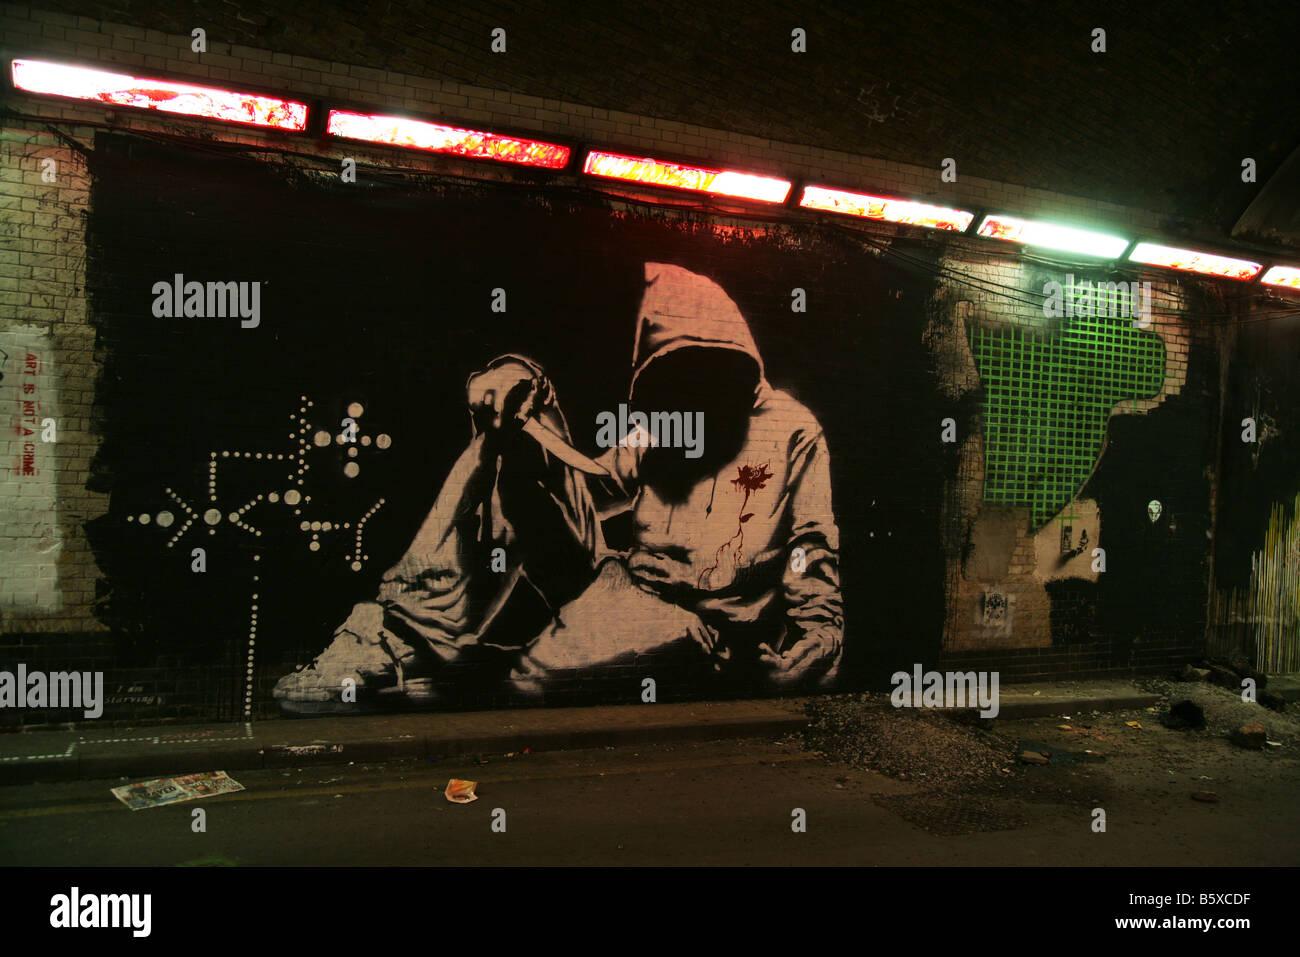 knife crime hoody hoodie Banksy graffiti artist art - Stock Image